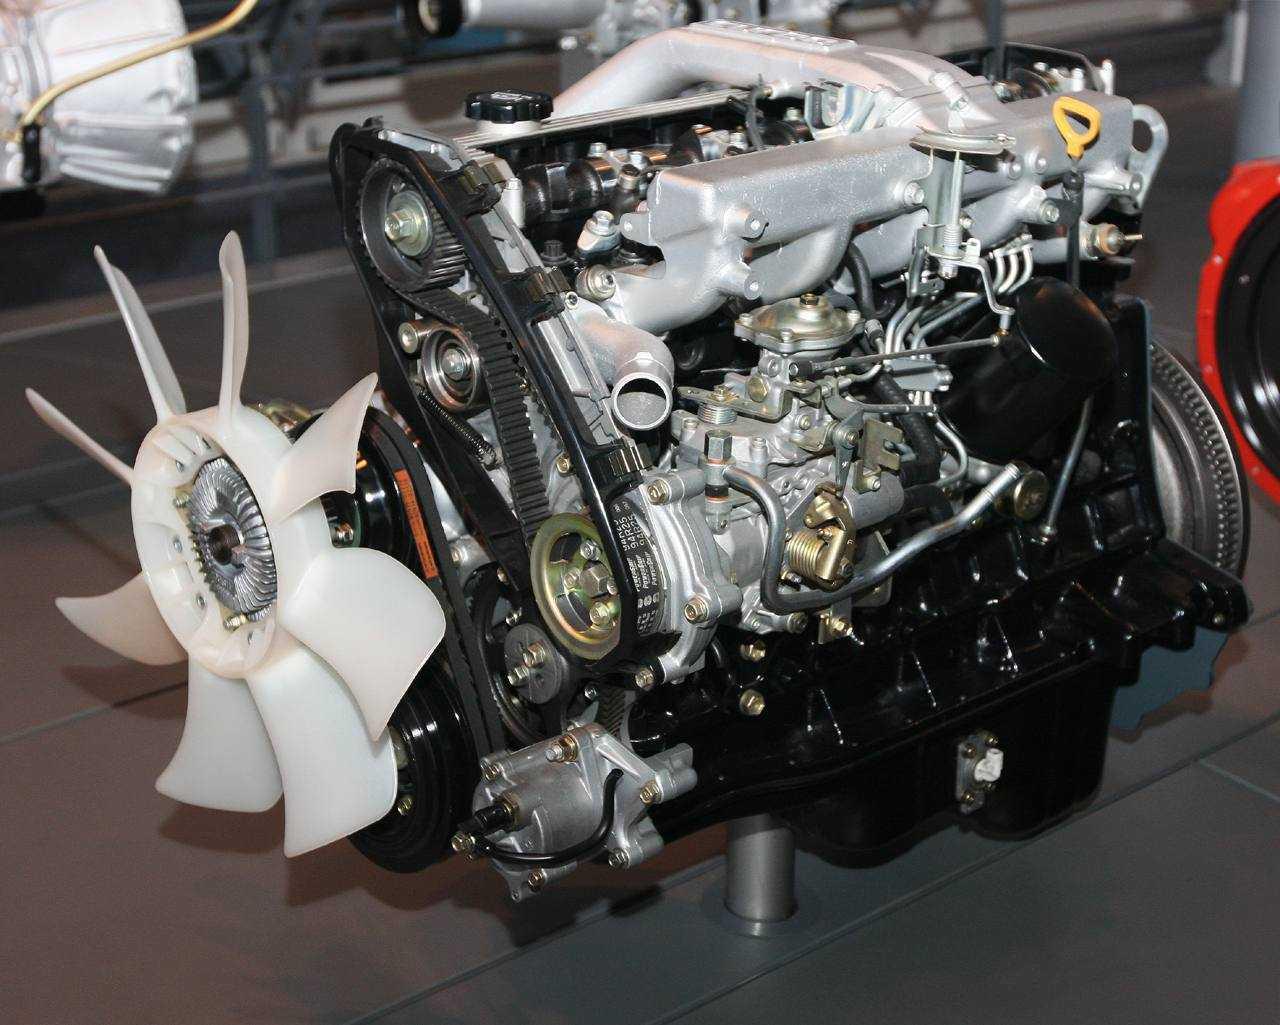 Radiator fan replacement